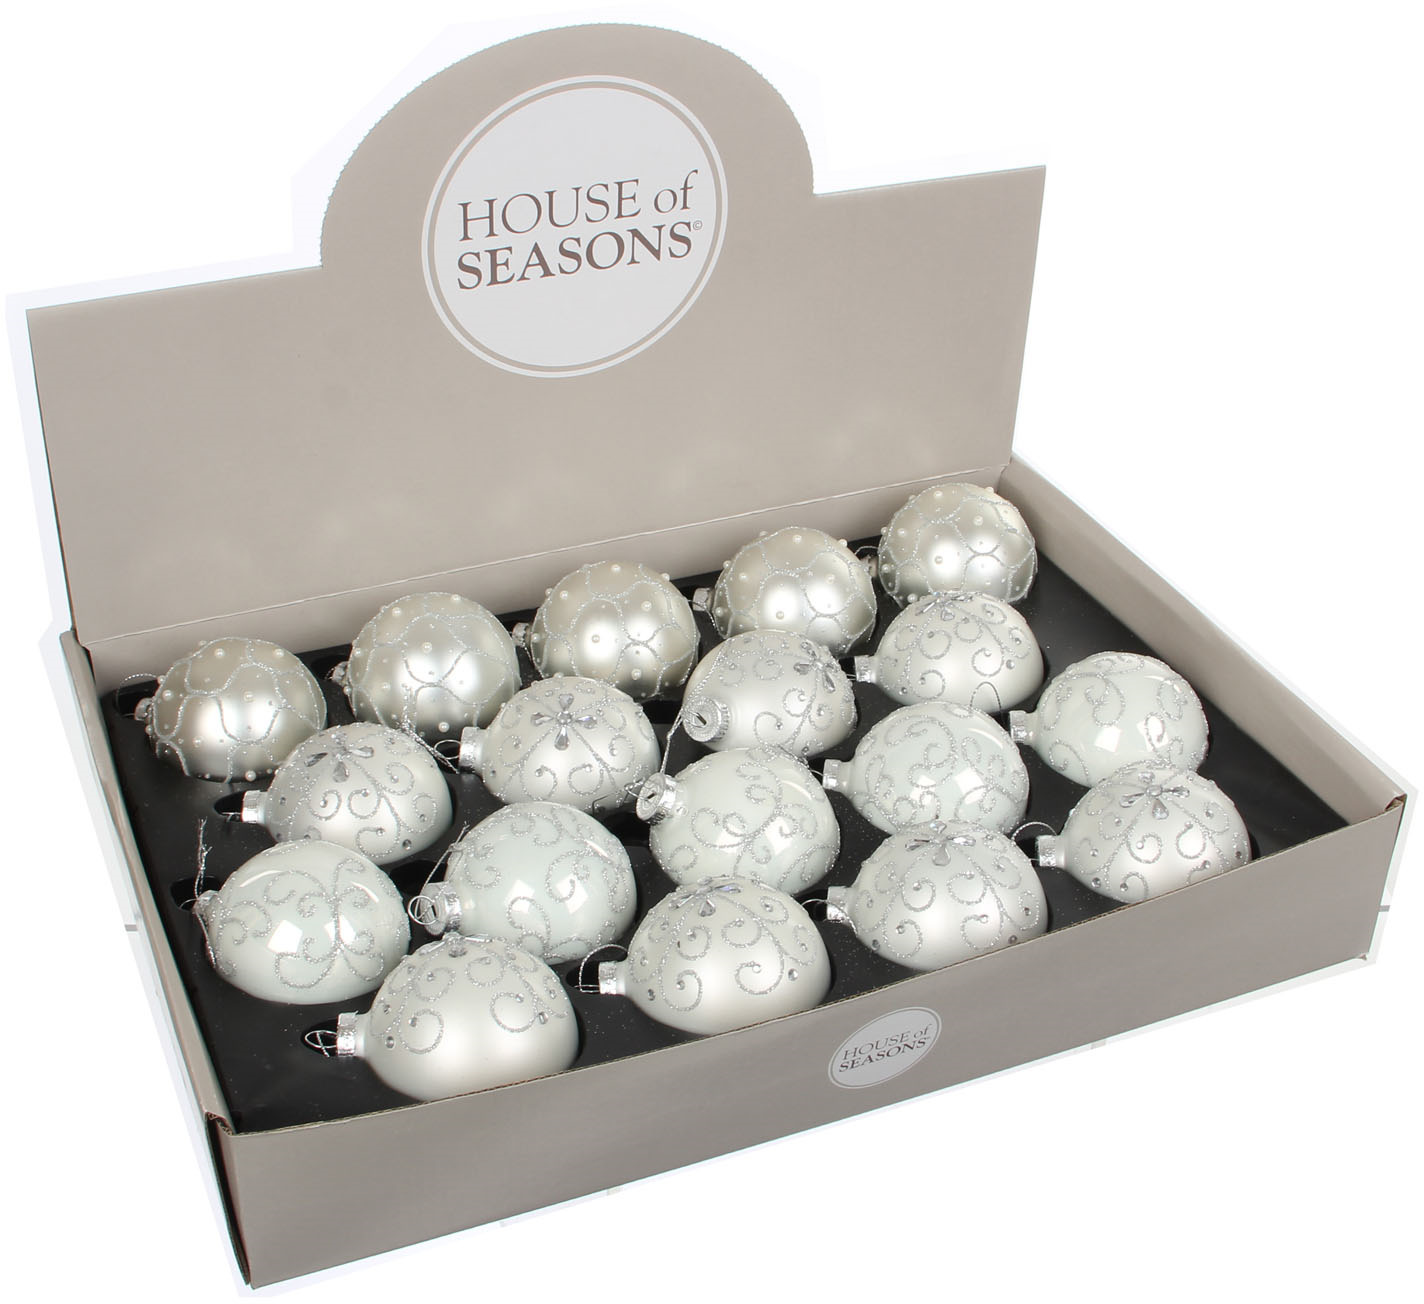 цена на Набор елочных игрушек House of Seasons Шар, цвет: белый, диаметр 7 см, 18 шт. 83108 (1028558)